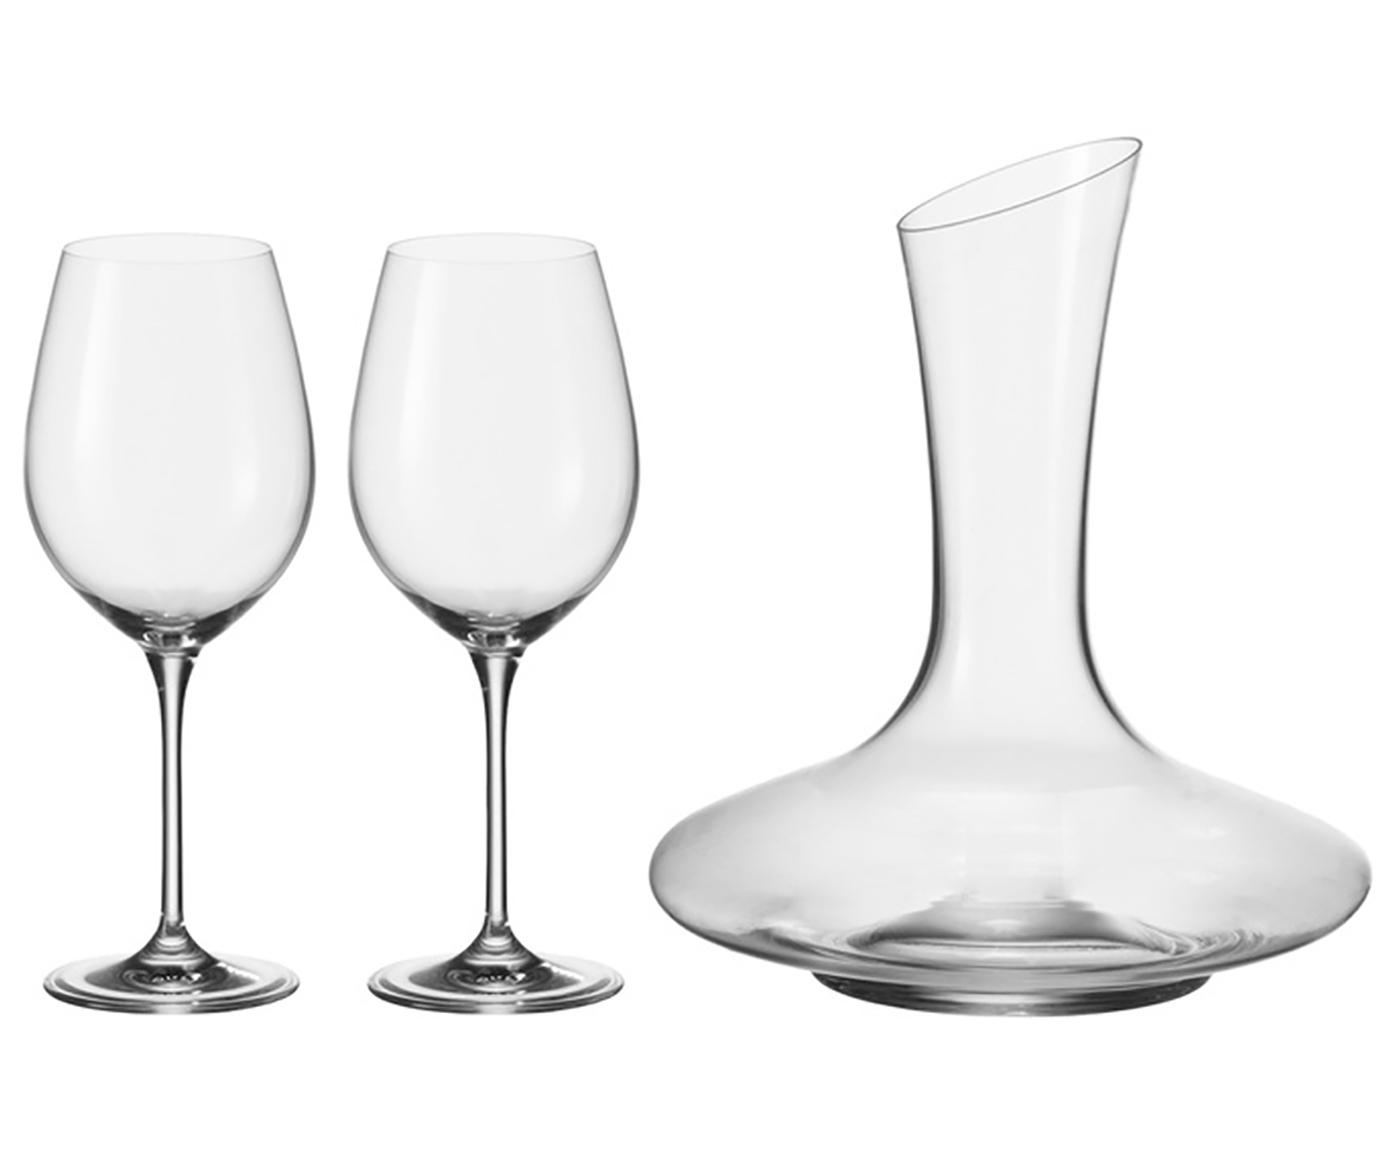 Set de vino tinto Barcelona, 3pzas., Vidrio, Transparente, Tamaños diferentes